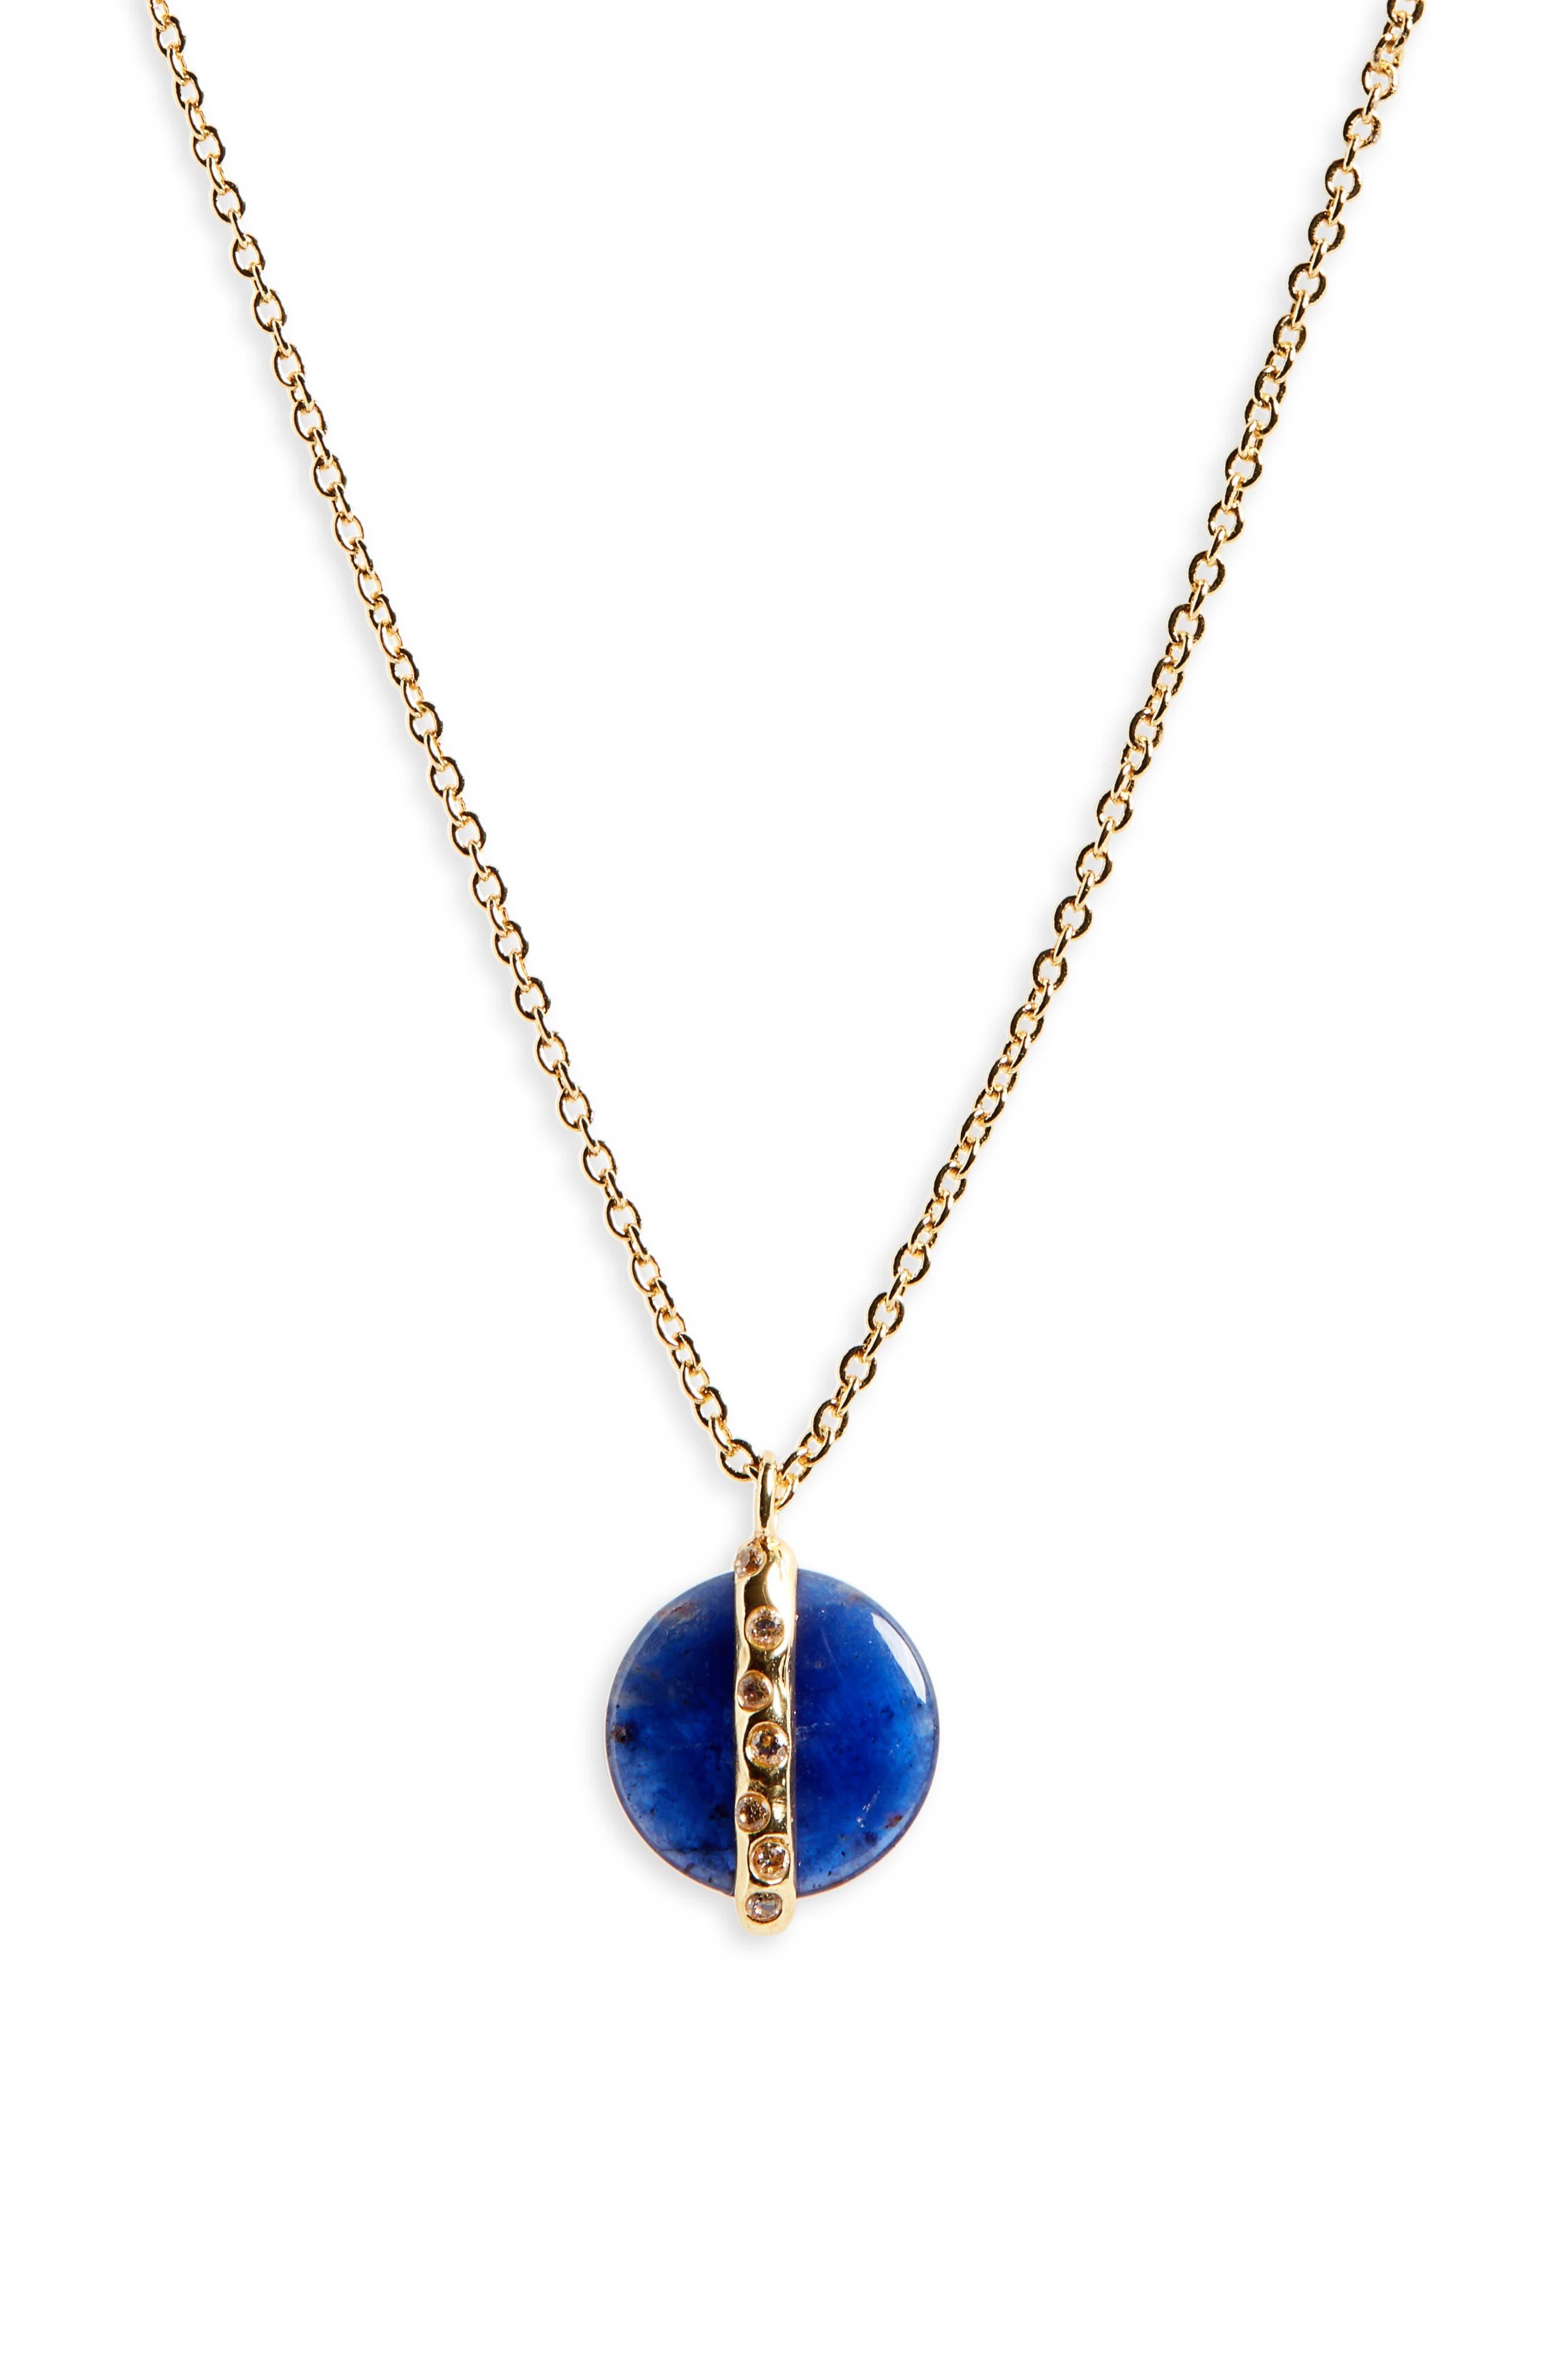 Brinn Shimmer Pendant Necklace,                             Alternate thumbnail 2, color,                             SODALITE/ GOLD